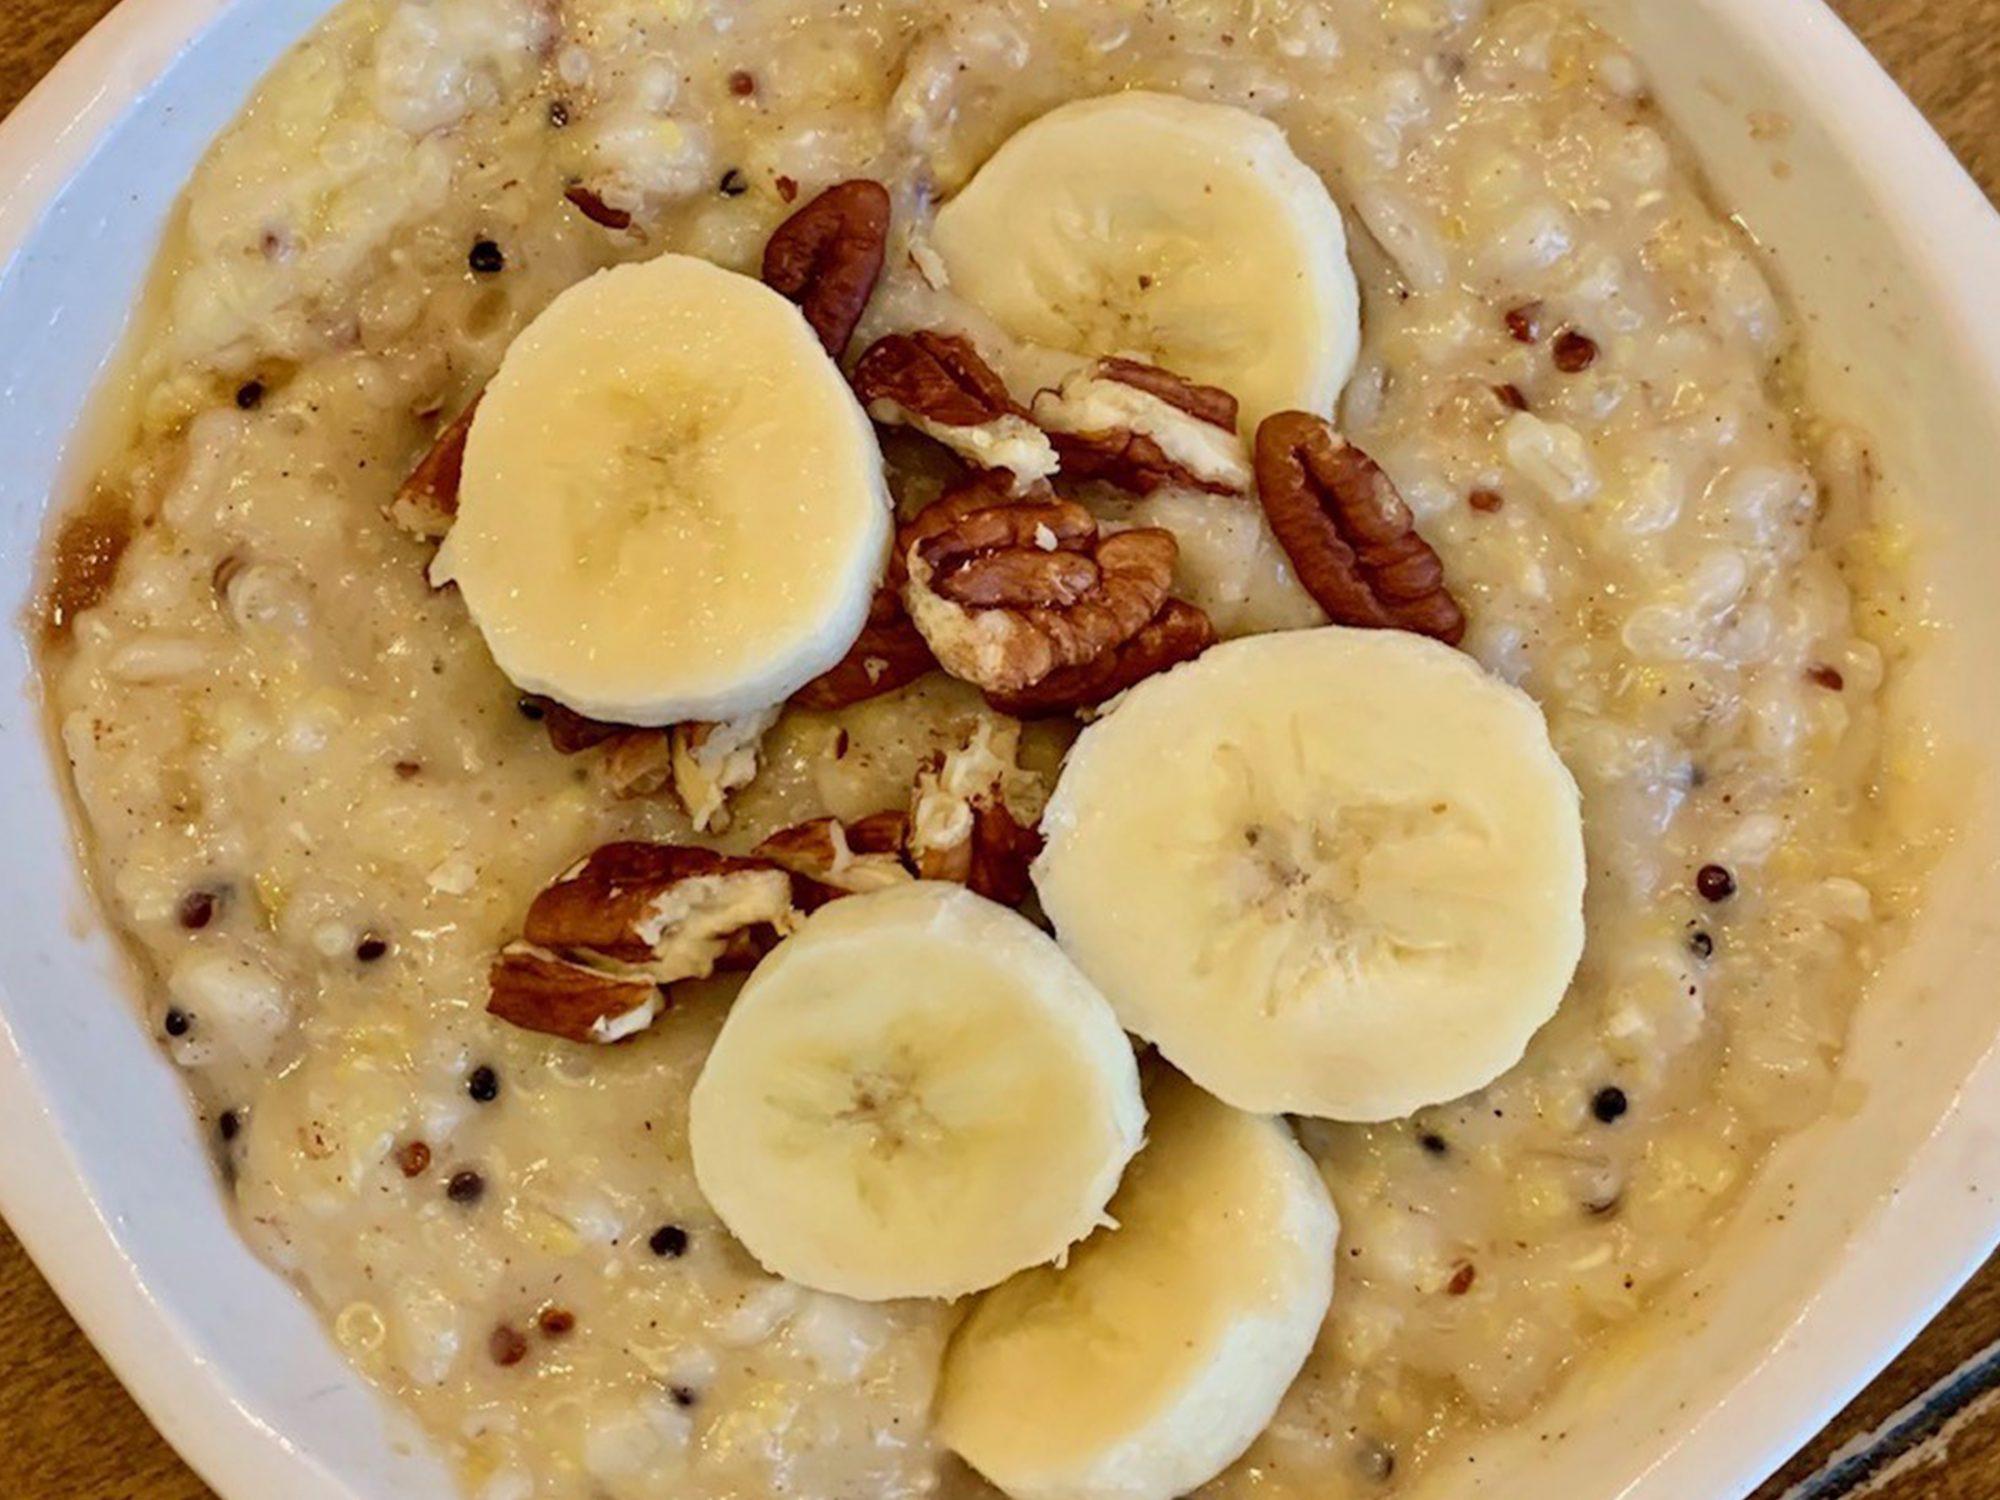 Porridge image